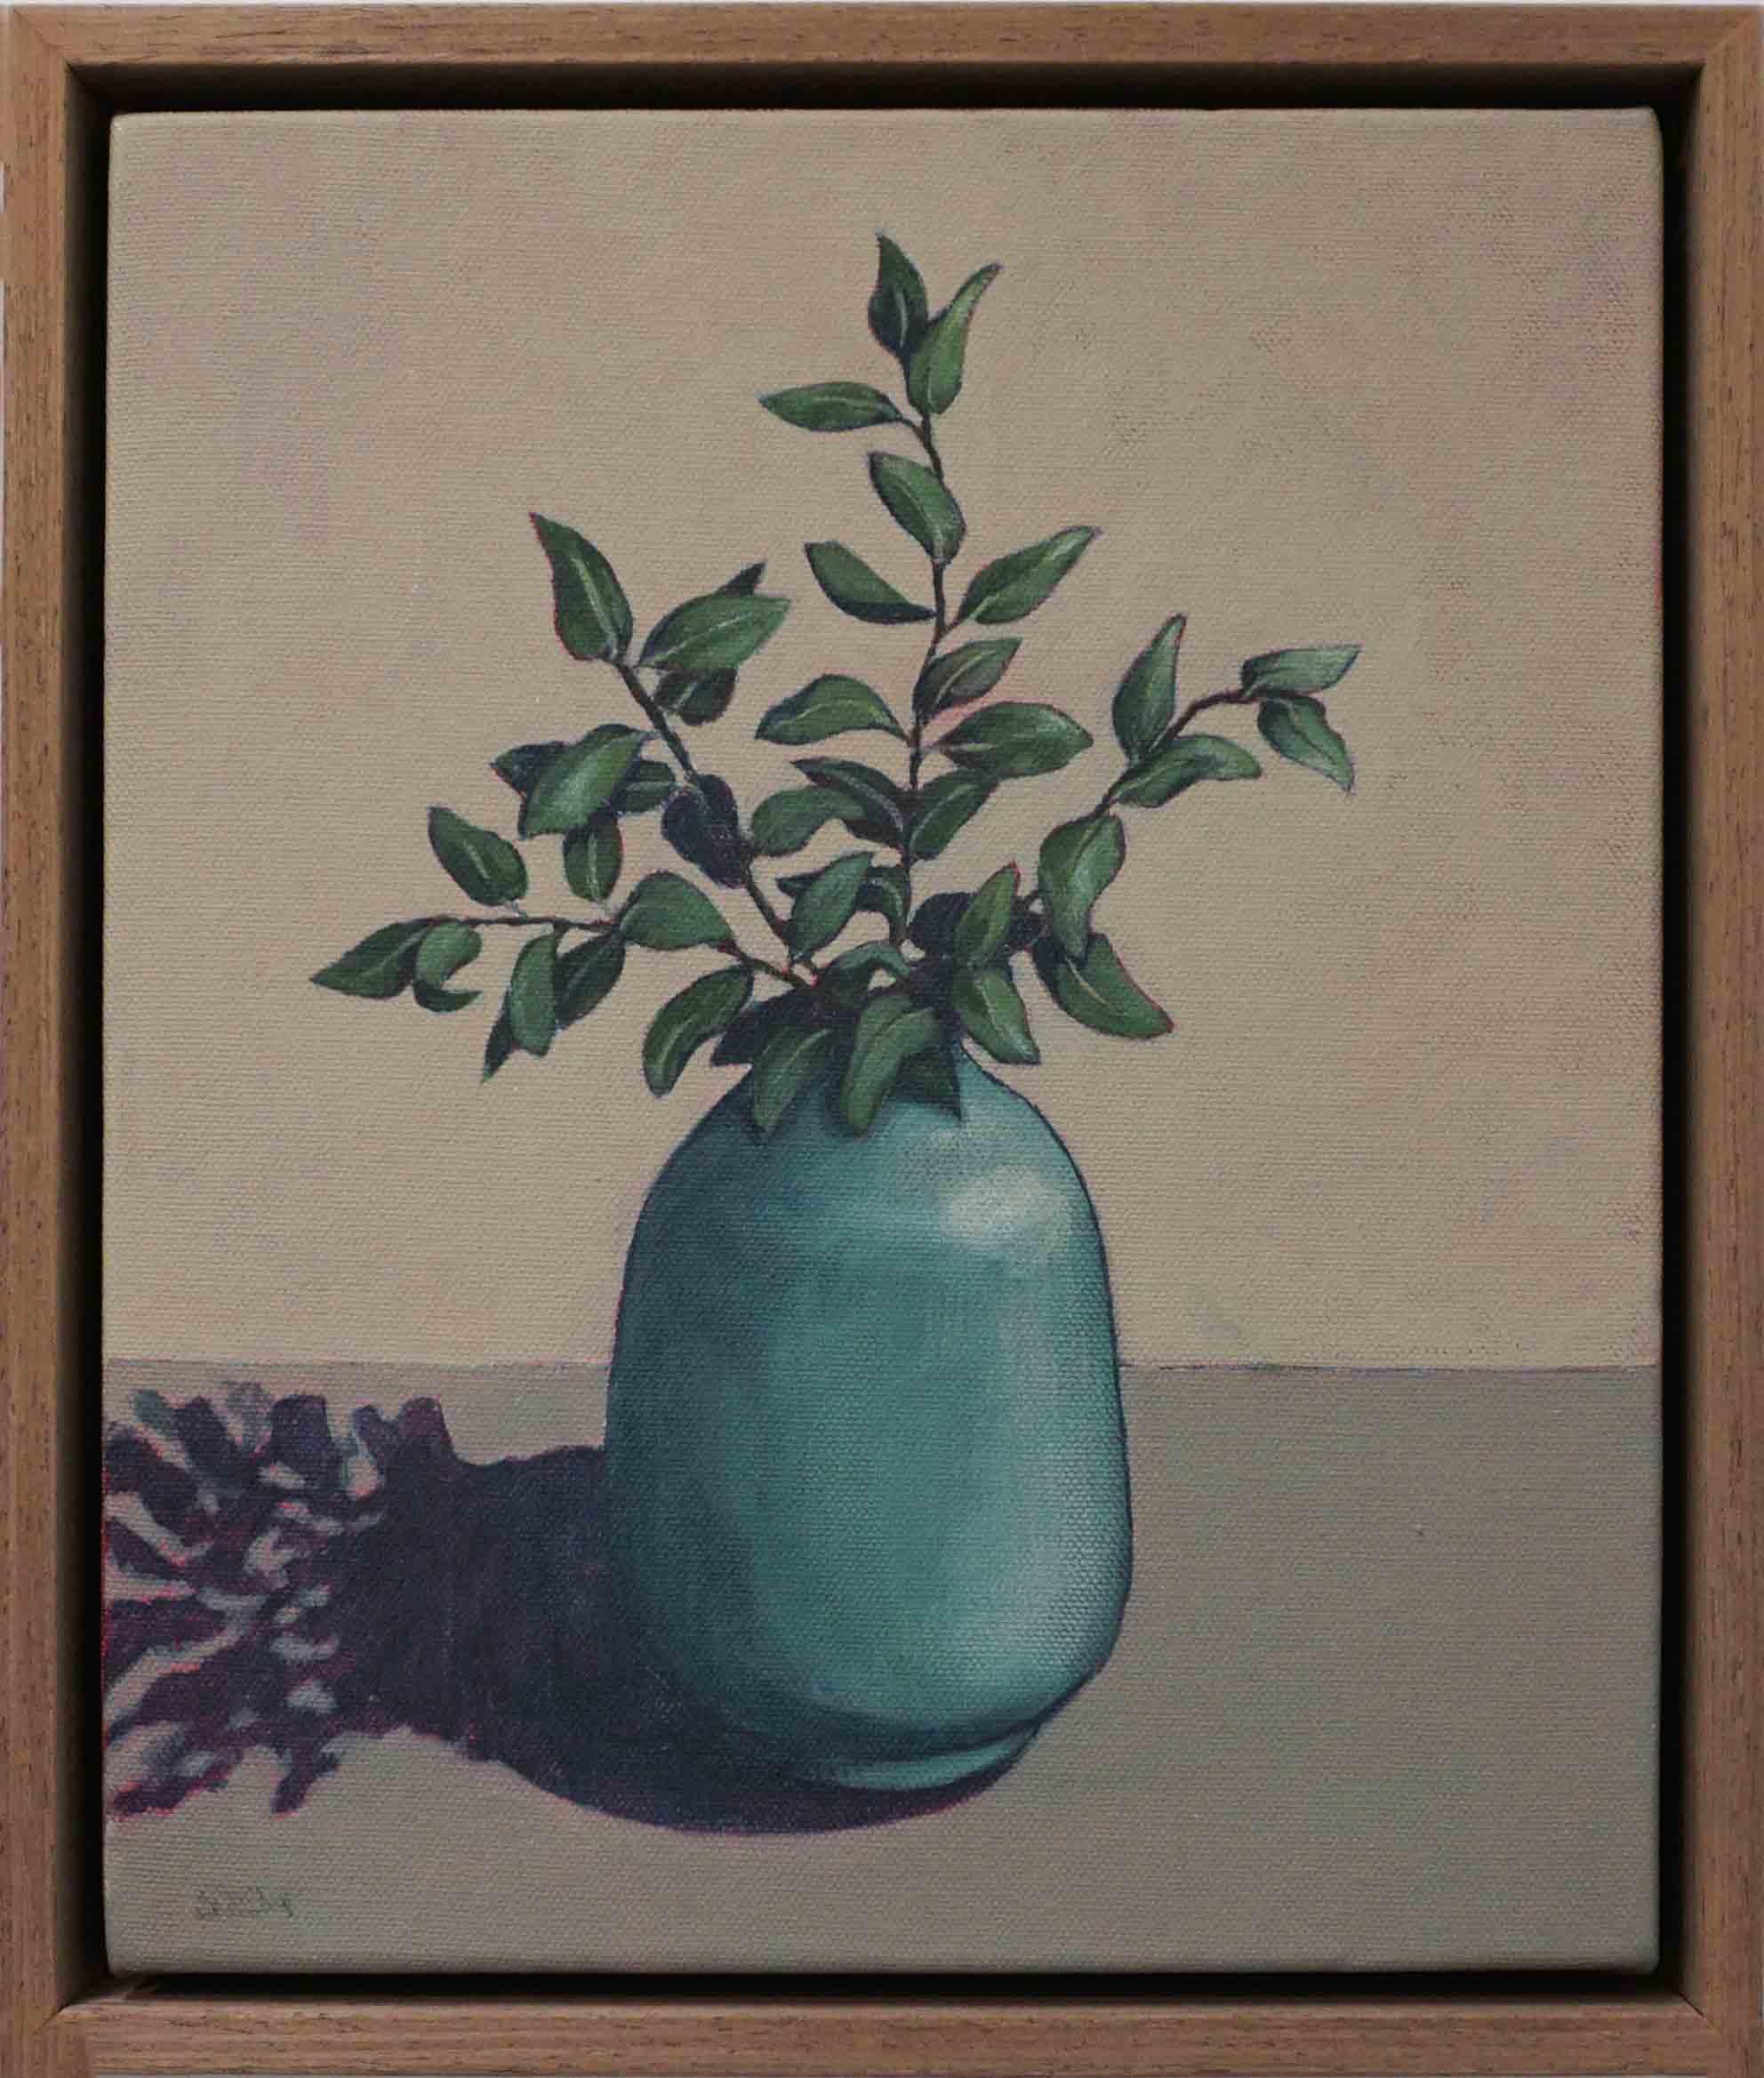 21. Sue Eva, 'Greenery', 2018, Acrylic on canvas, 30 x 25cm, $345